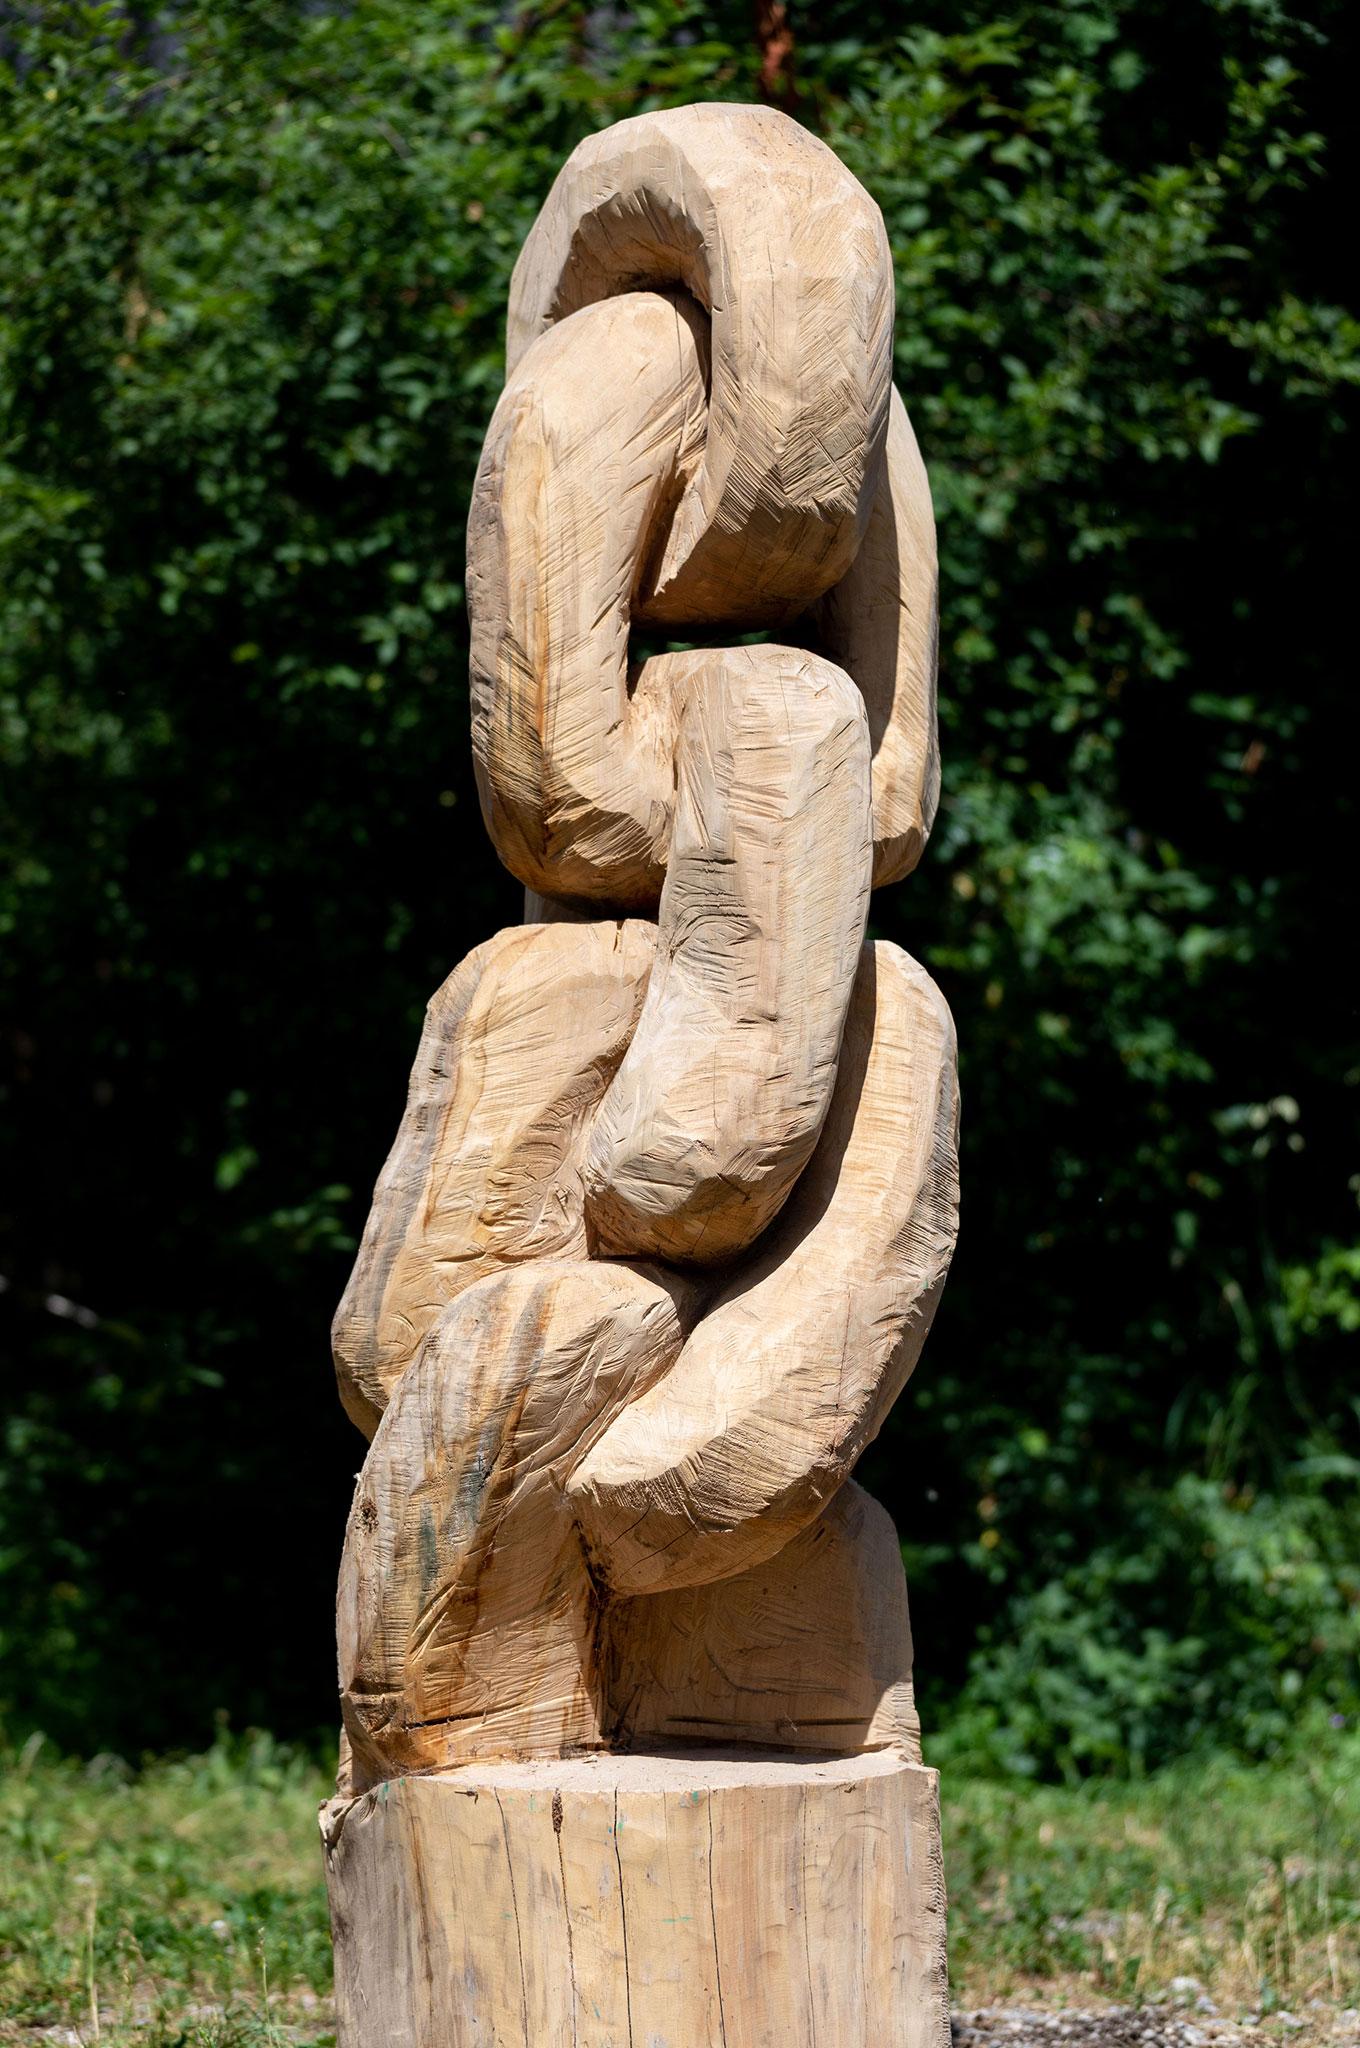 Lenggries-Kunstwochen-Skulptur-Hannes-Kinau-01